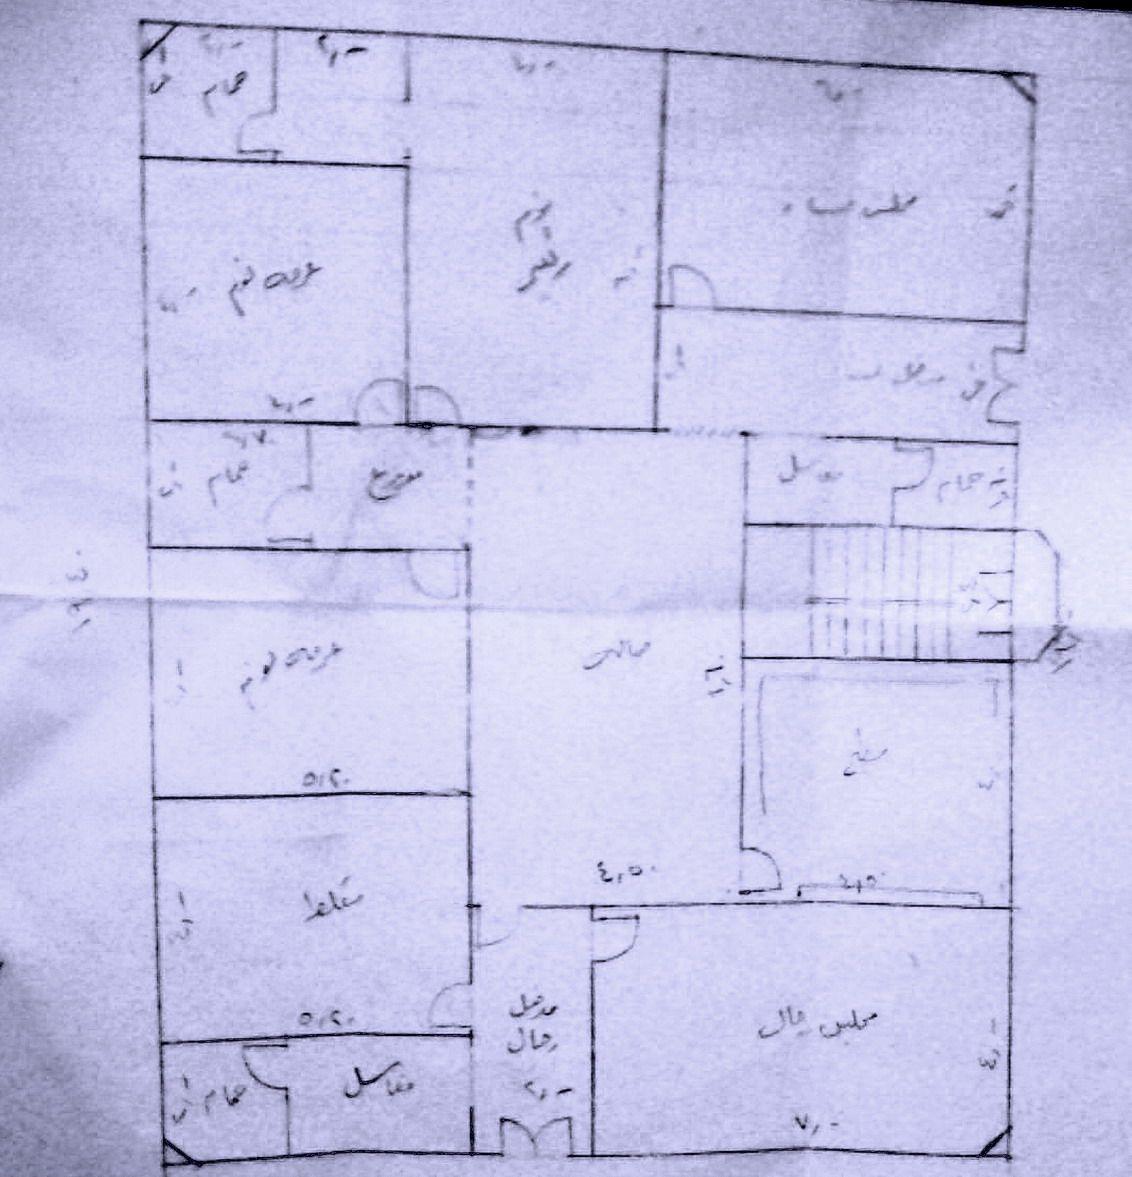 اليكم مخطط لمنزلي ويبقى اخذ الرأي منكم Model House Plan Family House Plans New House Plans